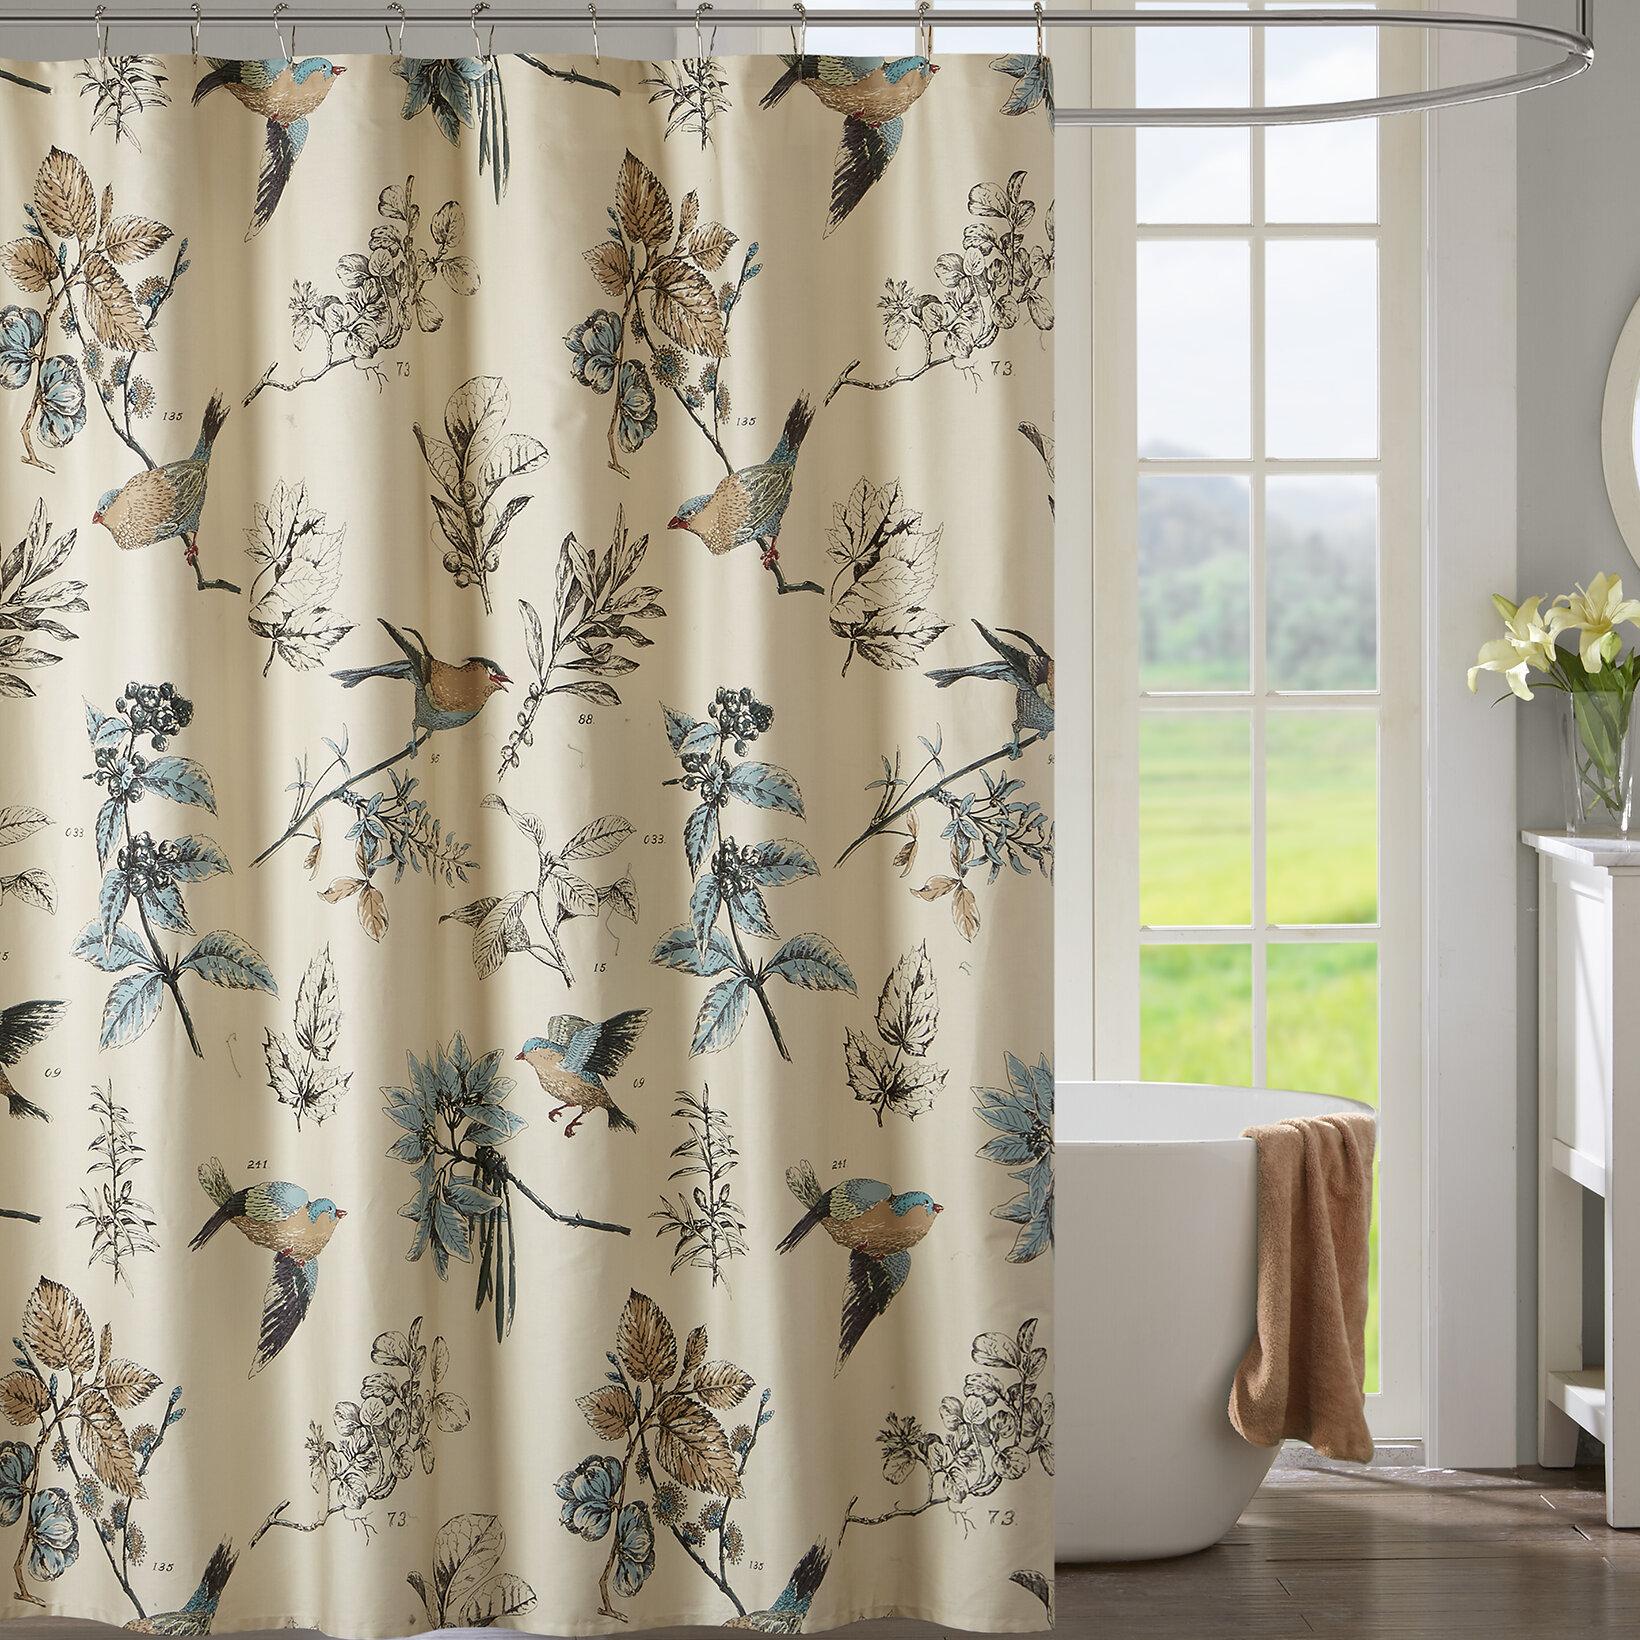 Charlton Home Shawnee 100% Cotton Shower Curtain U0026 Reviews | Wayfair